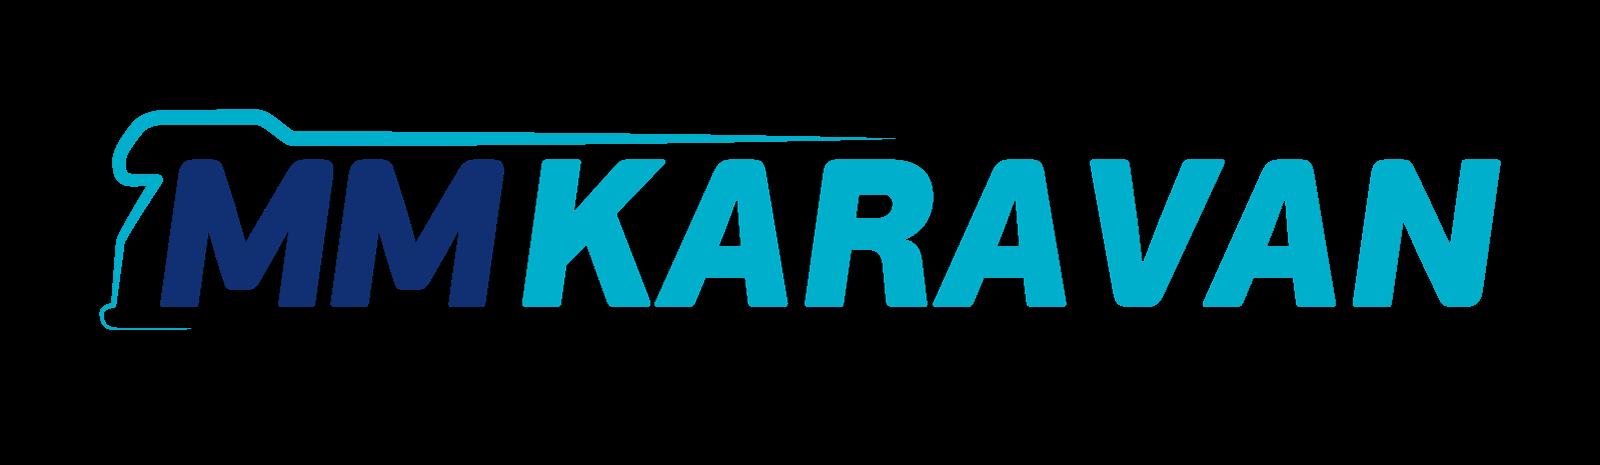 MM Karavan